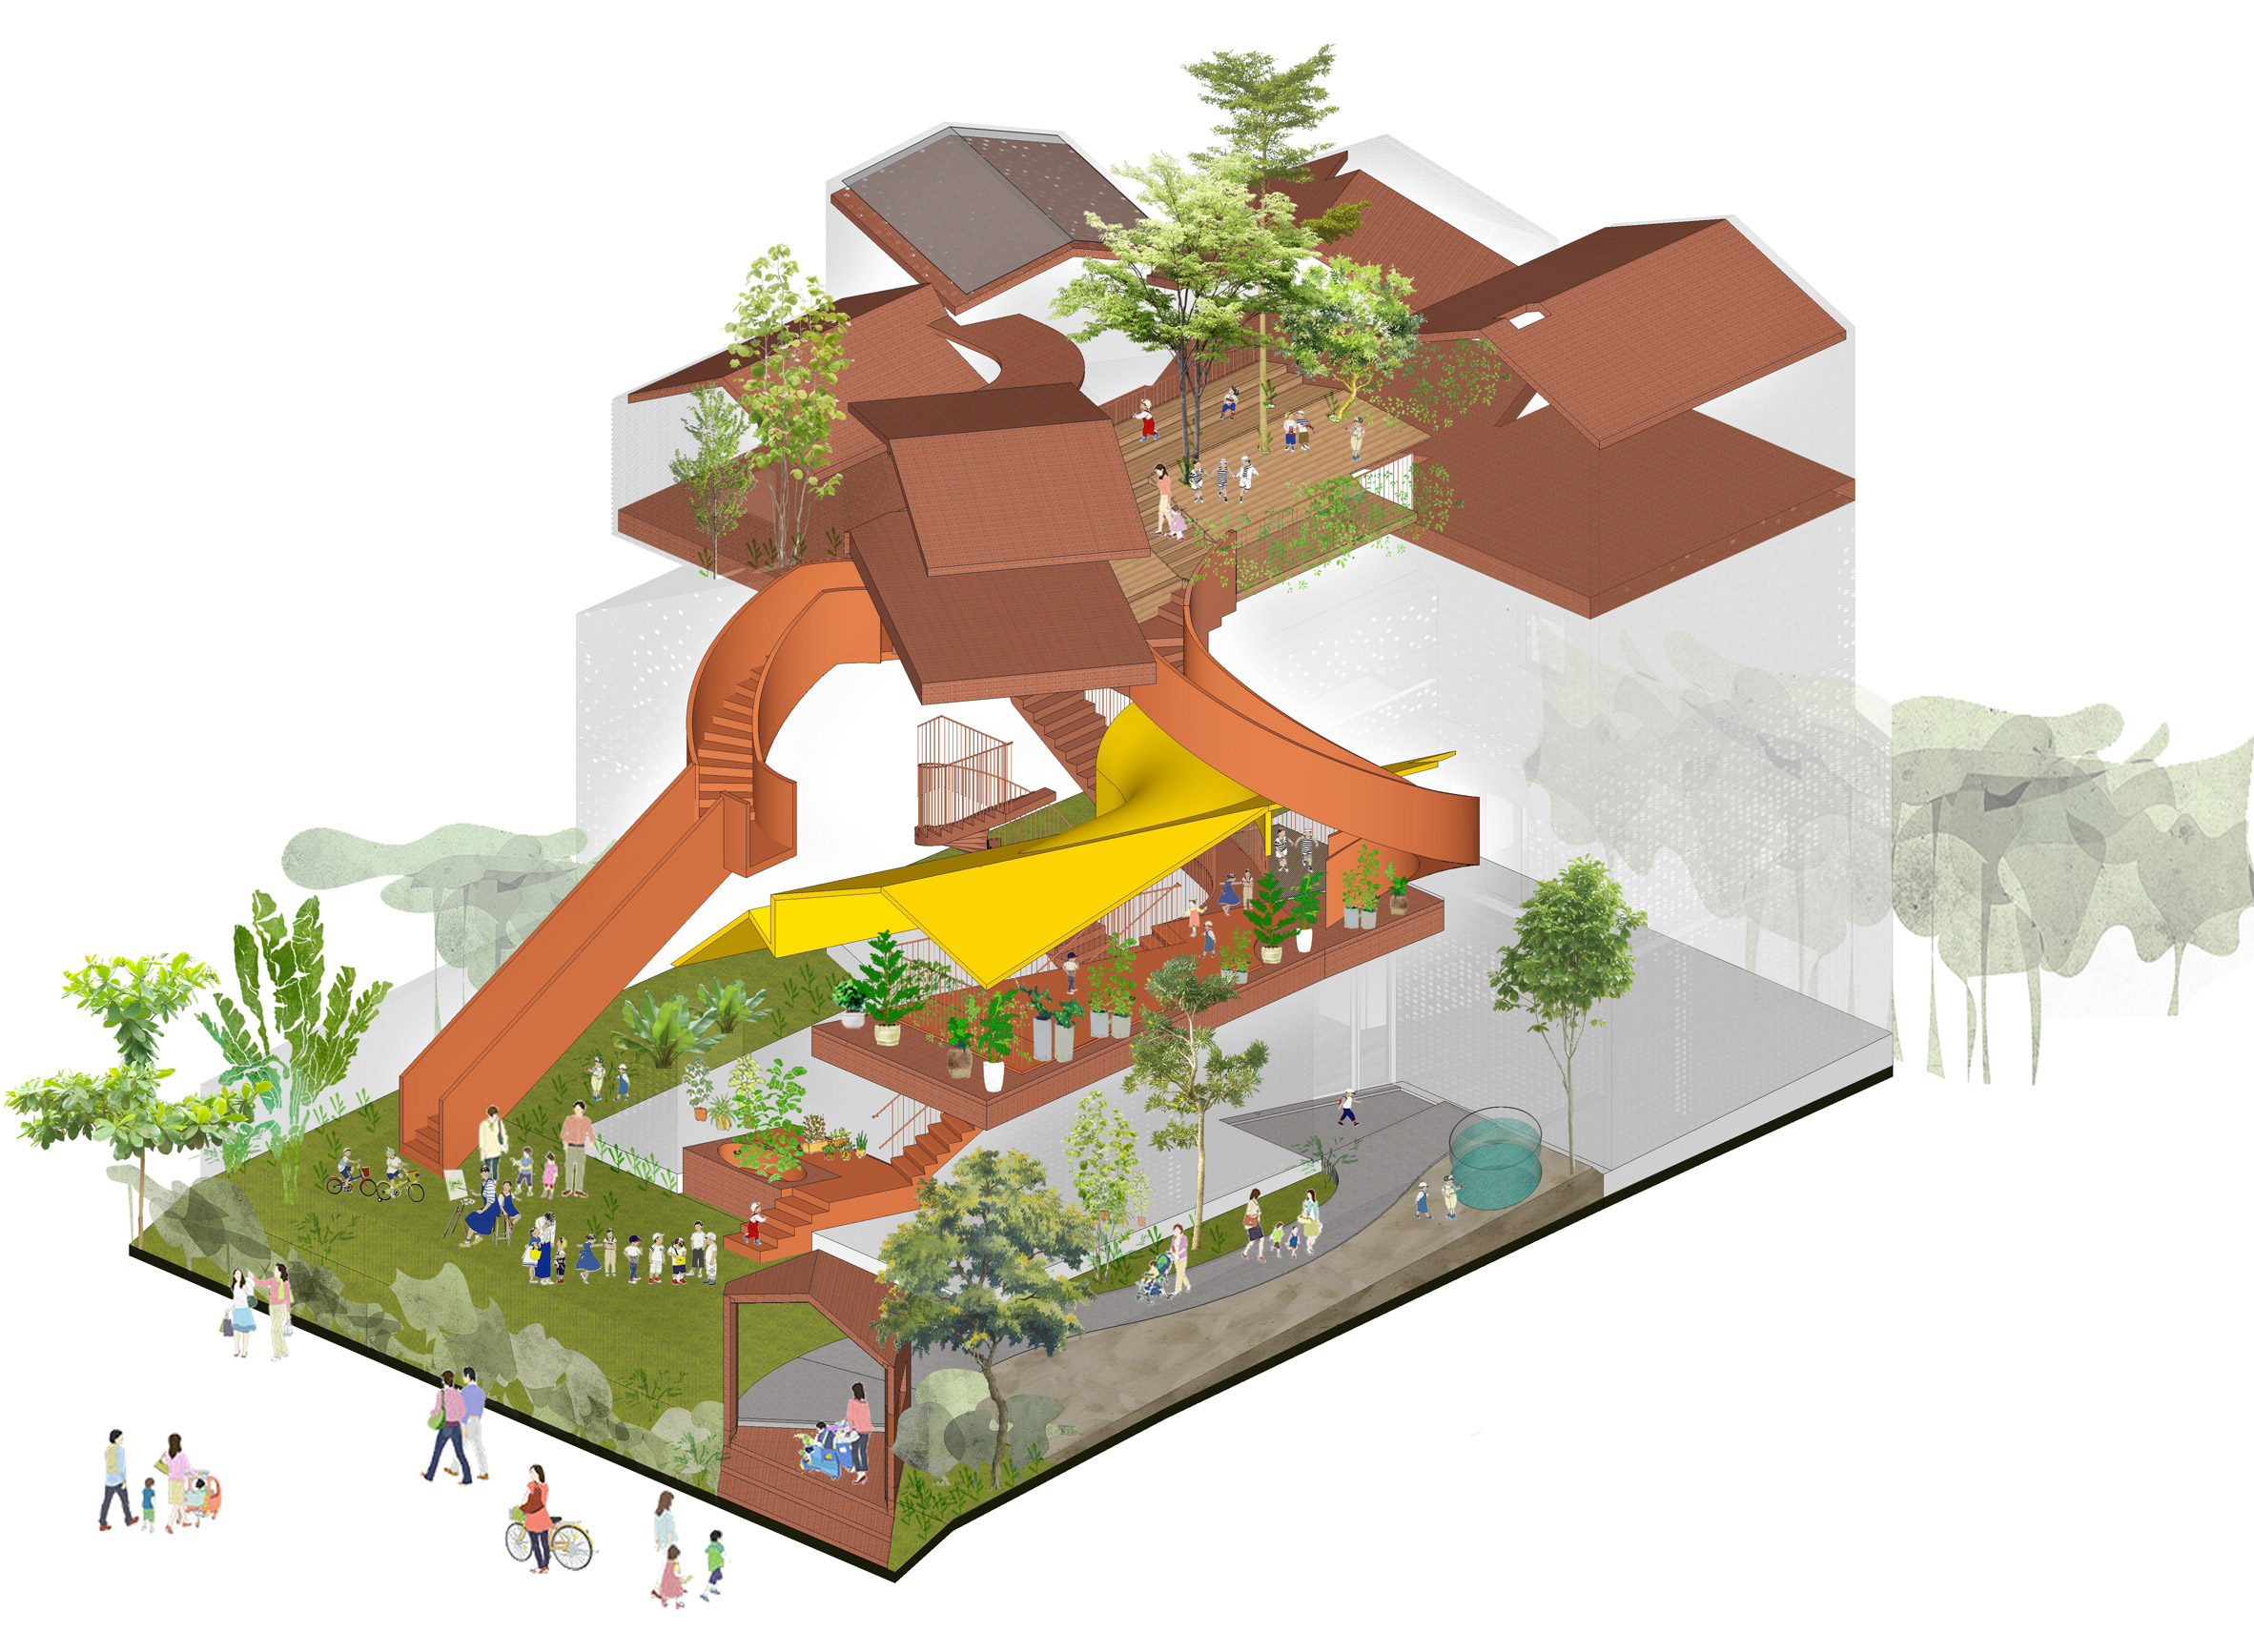 chuon-chuon-kim-kindergarten-kientruc-o-architecture-education-vietnam_dezeen_axo.jpg